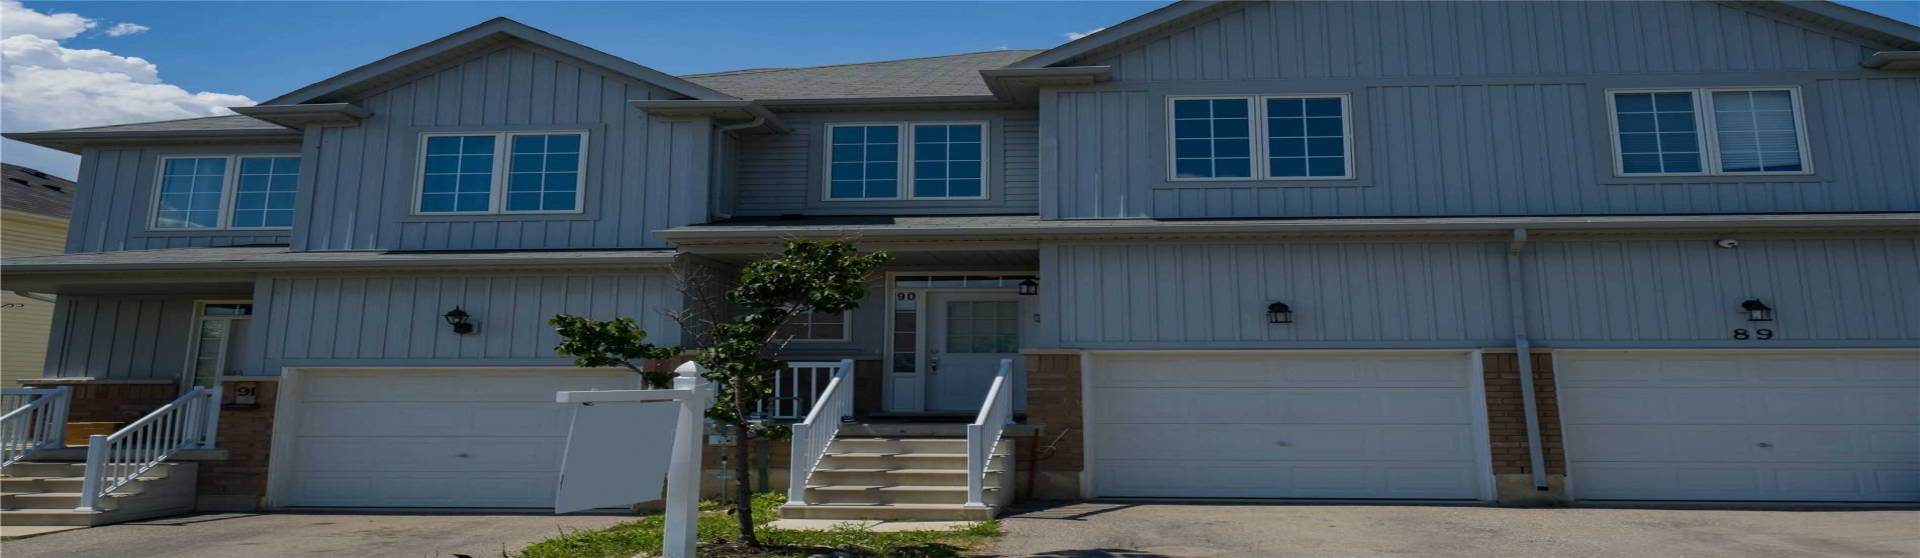 21 Diana Ave- Brantford- Ontario N3T0G7, 3 Bedrooms Bedrooms, 6 Rooms Rooms,3 BathroomsBathrooms,Att/row/twnhouse,Sale,Diana,X4812295